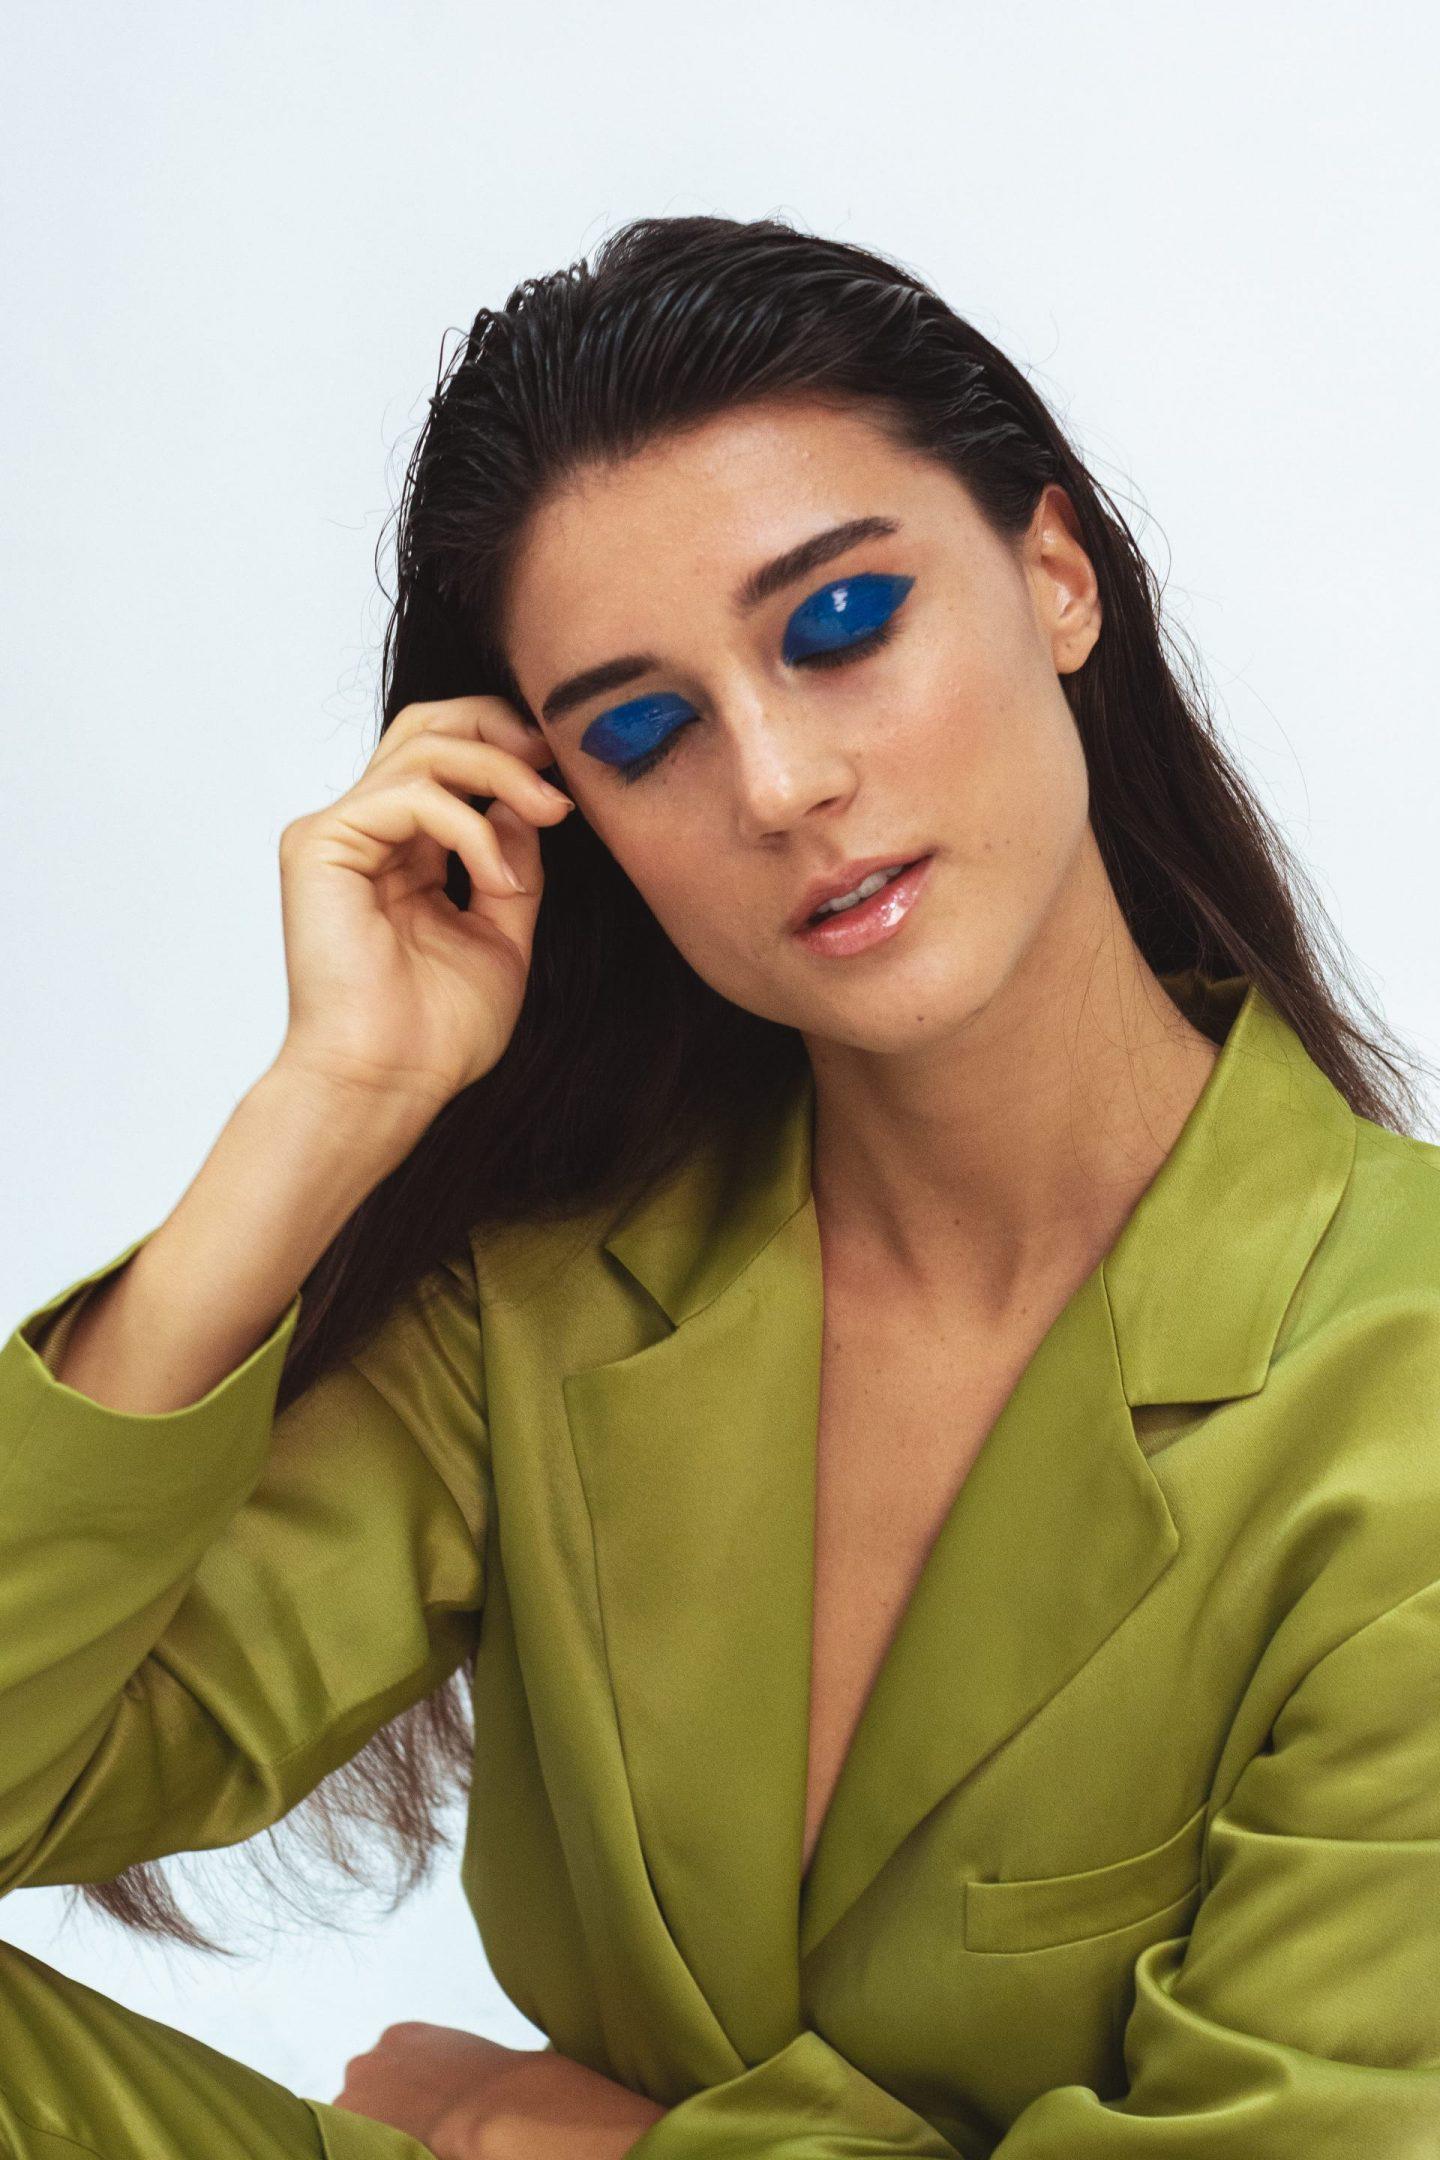 Fashion Styling by Lisa Campolunghi